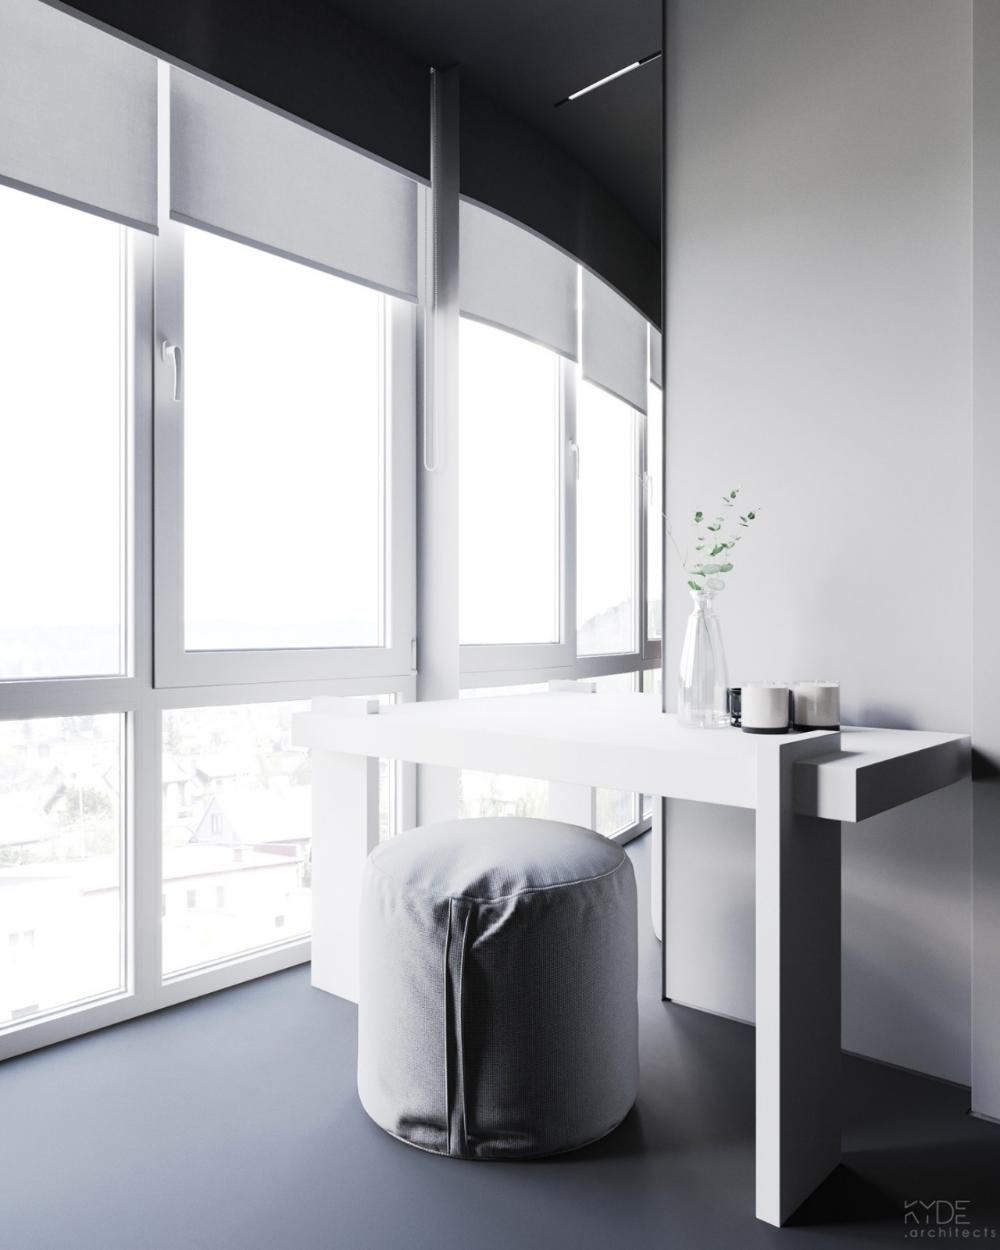 Autodesk Room Design: 现代简约风家庭公寓 Nazar Tsimbalyuk